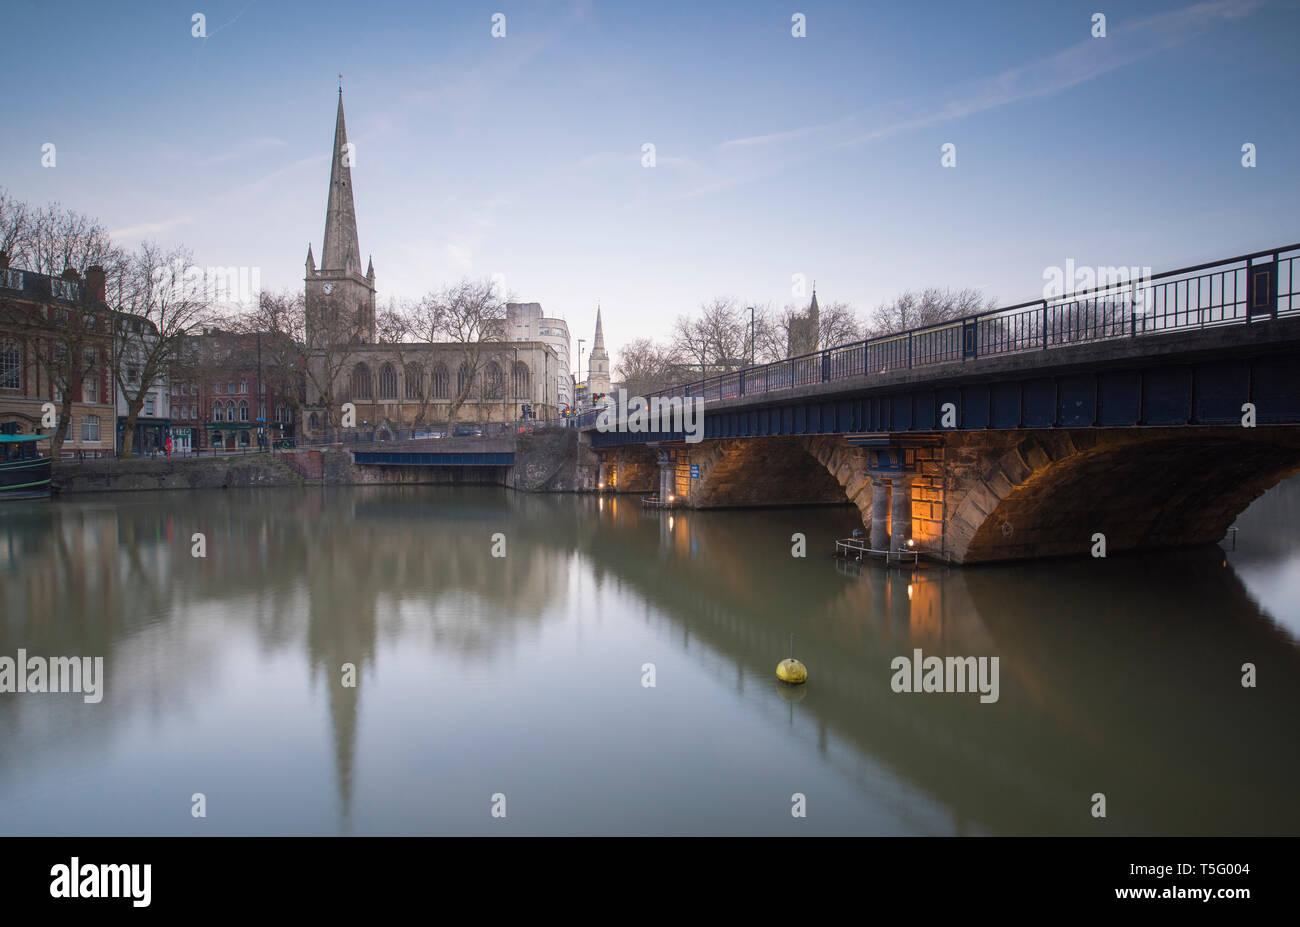 Bristol Bridge Beata Cosgrove Photography - Stock Image